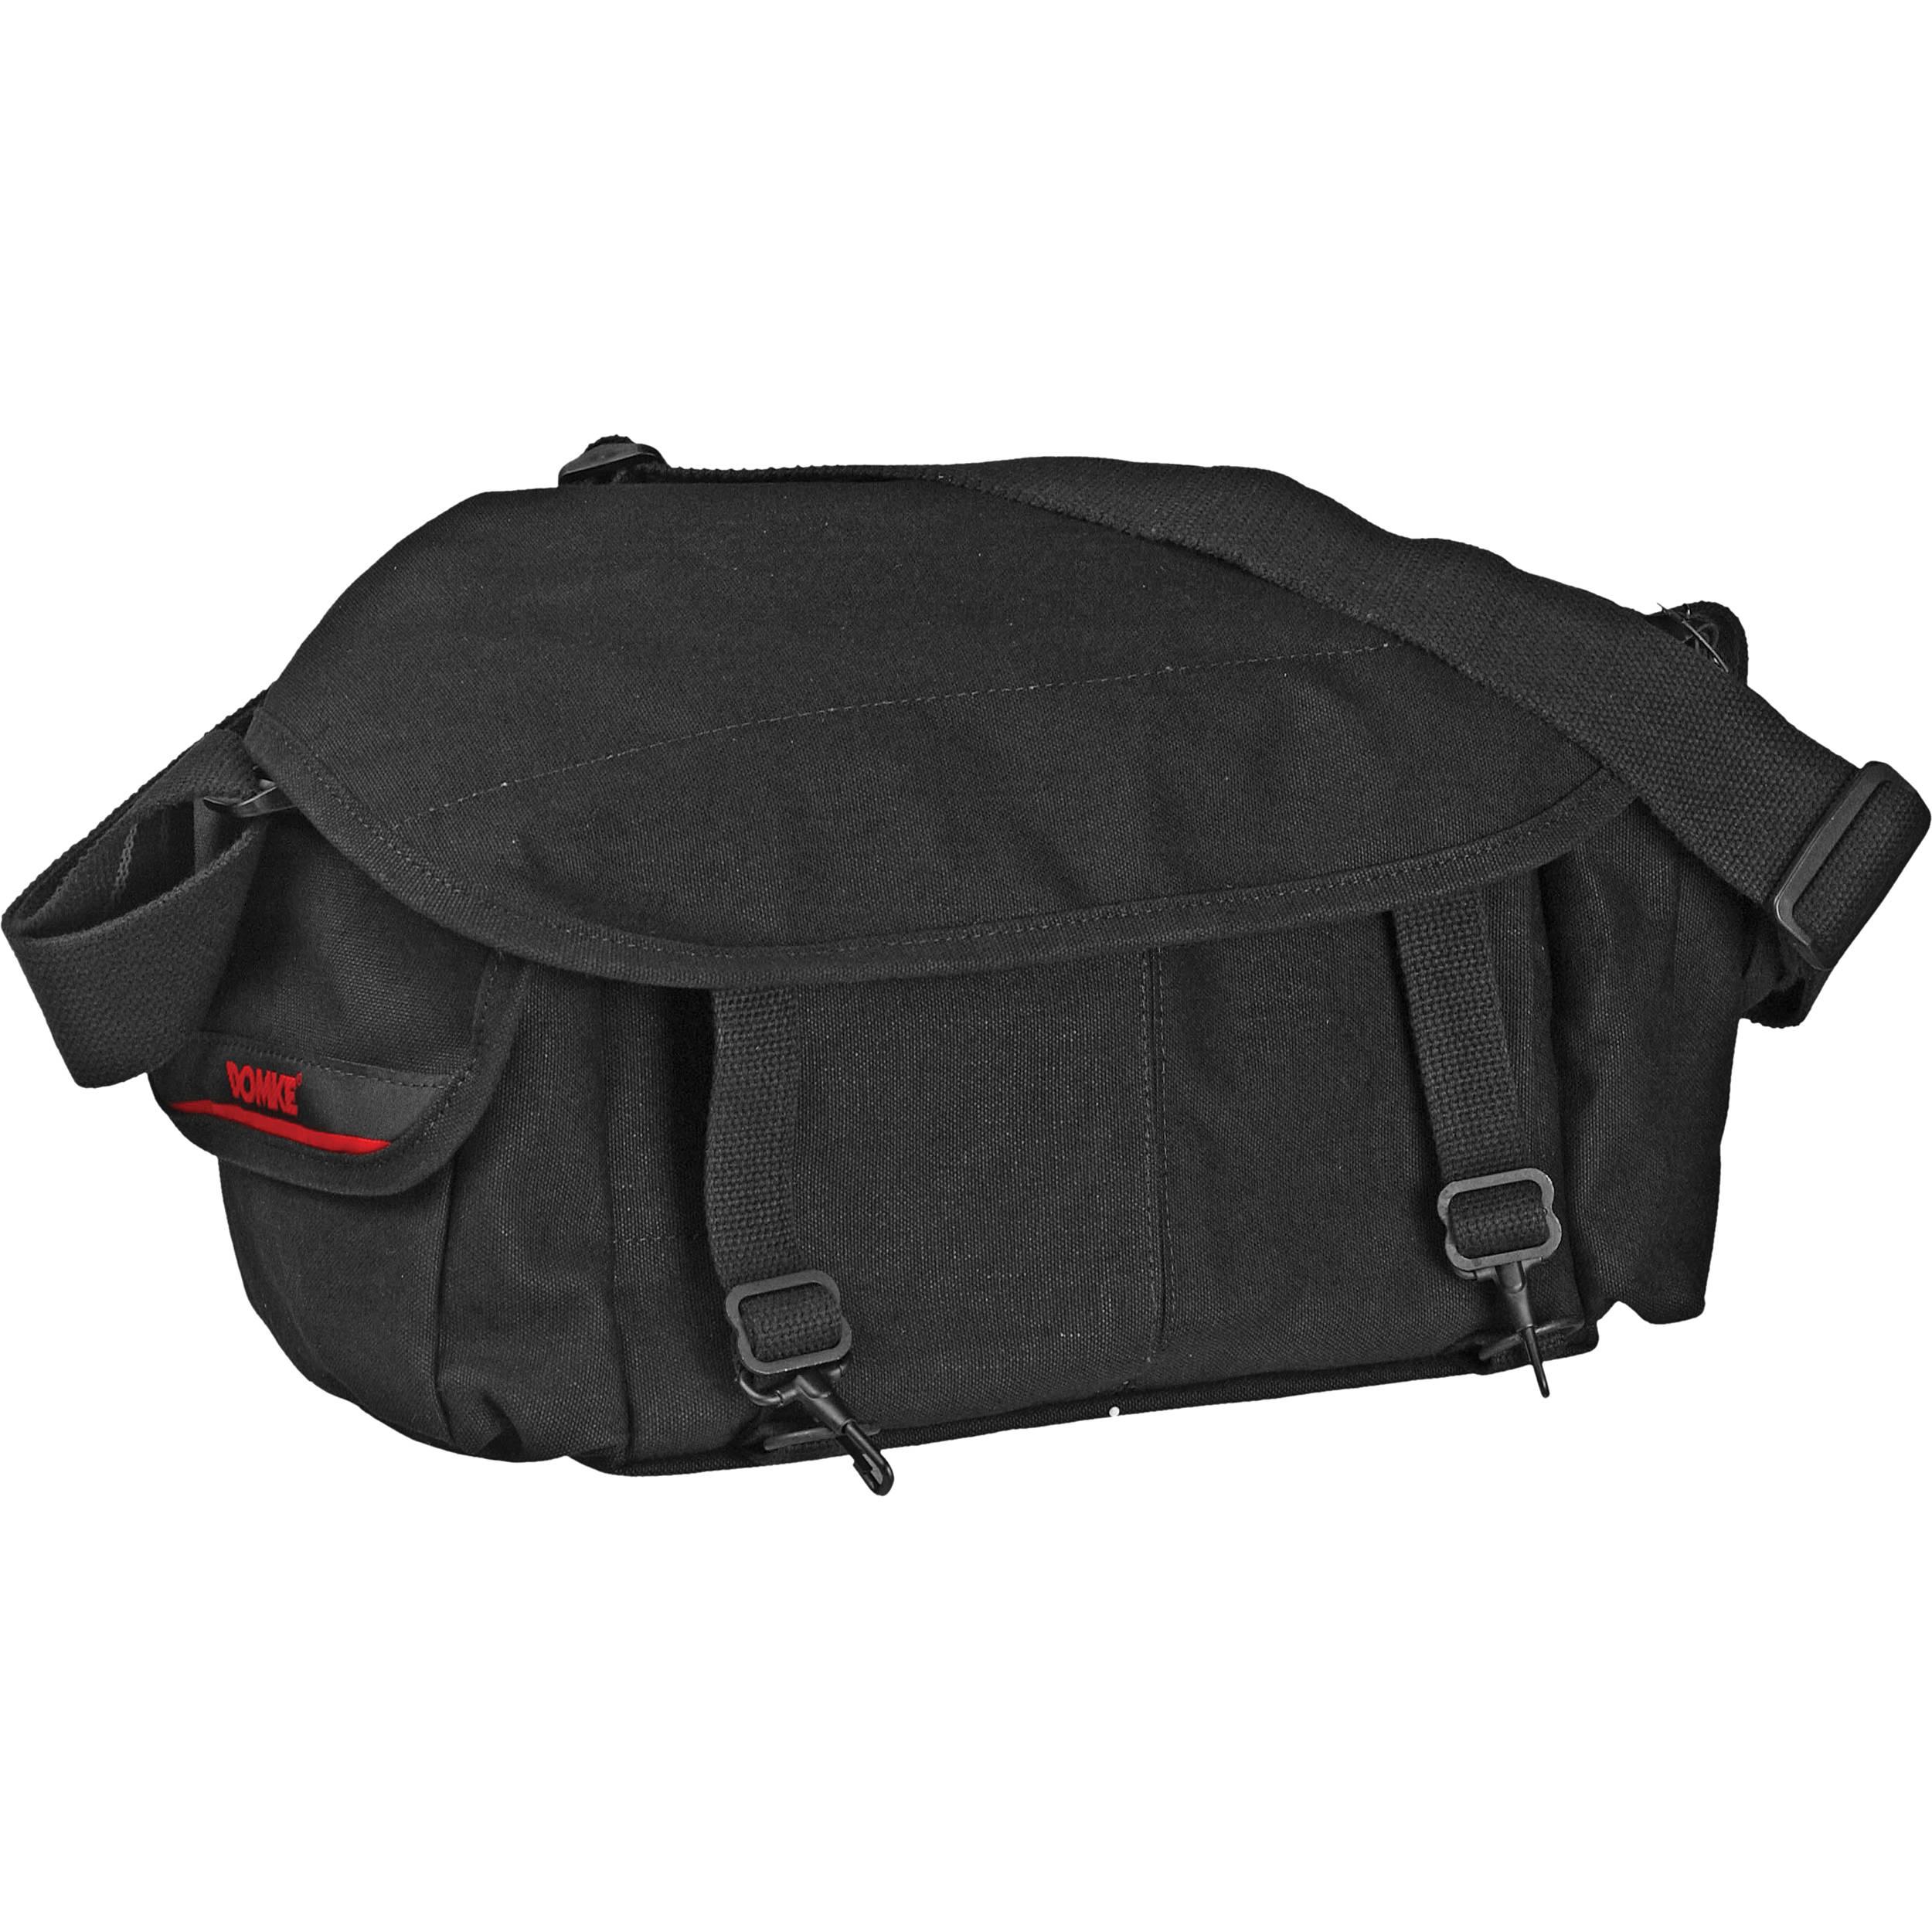 Domke F-2 Original Shoulder Bag (Black) 700-02B B H Photo Video 93b2a5be3719d